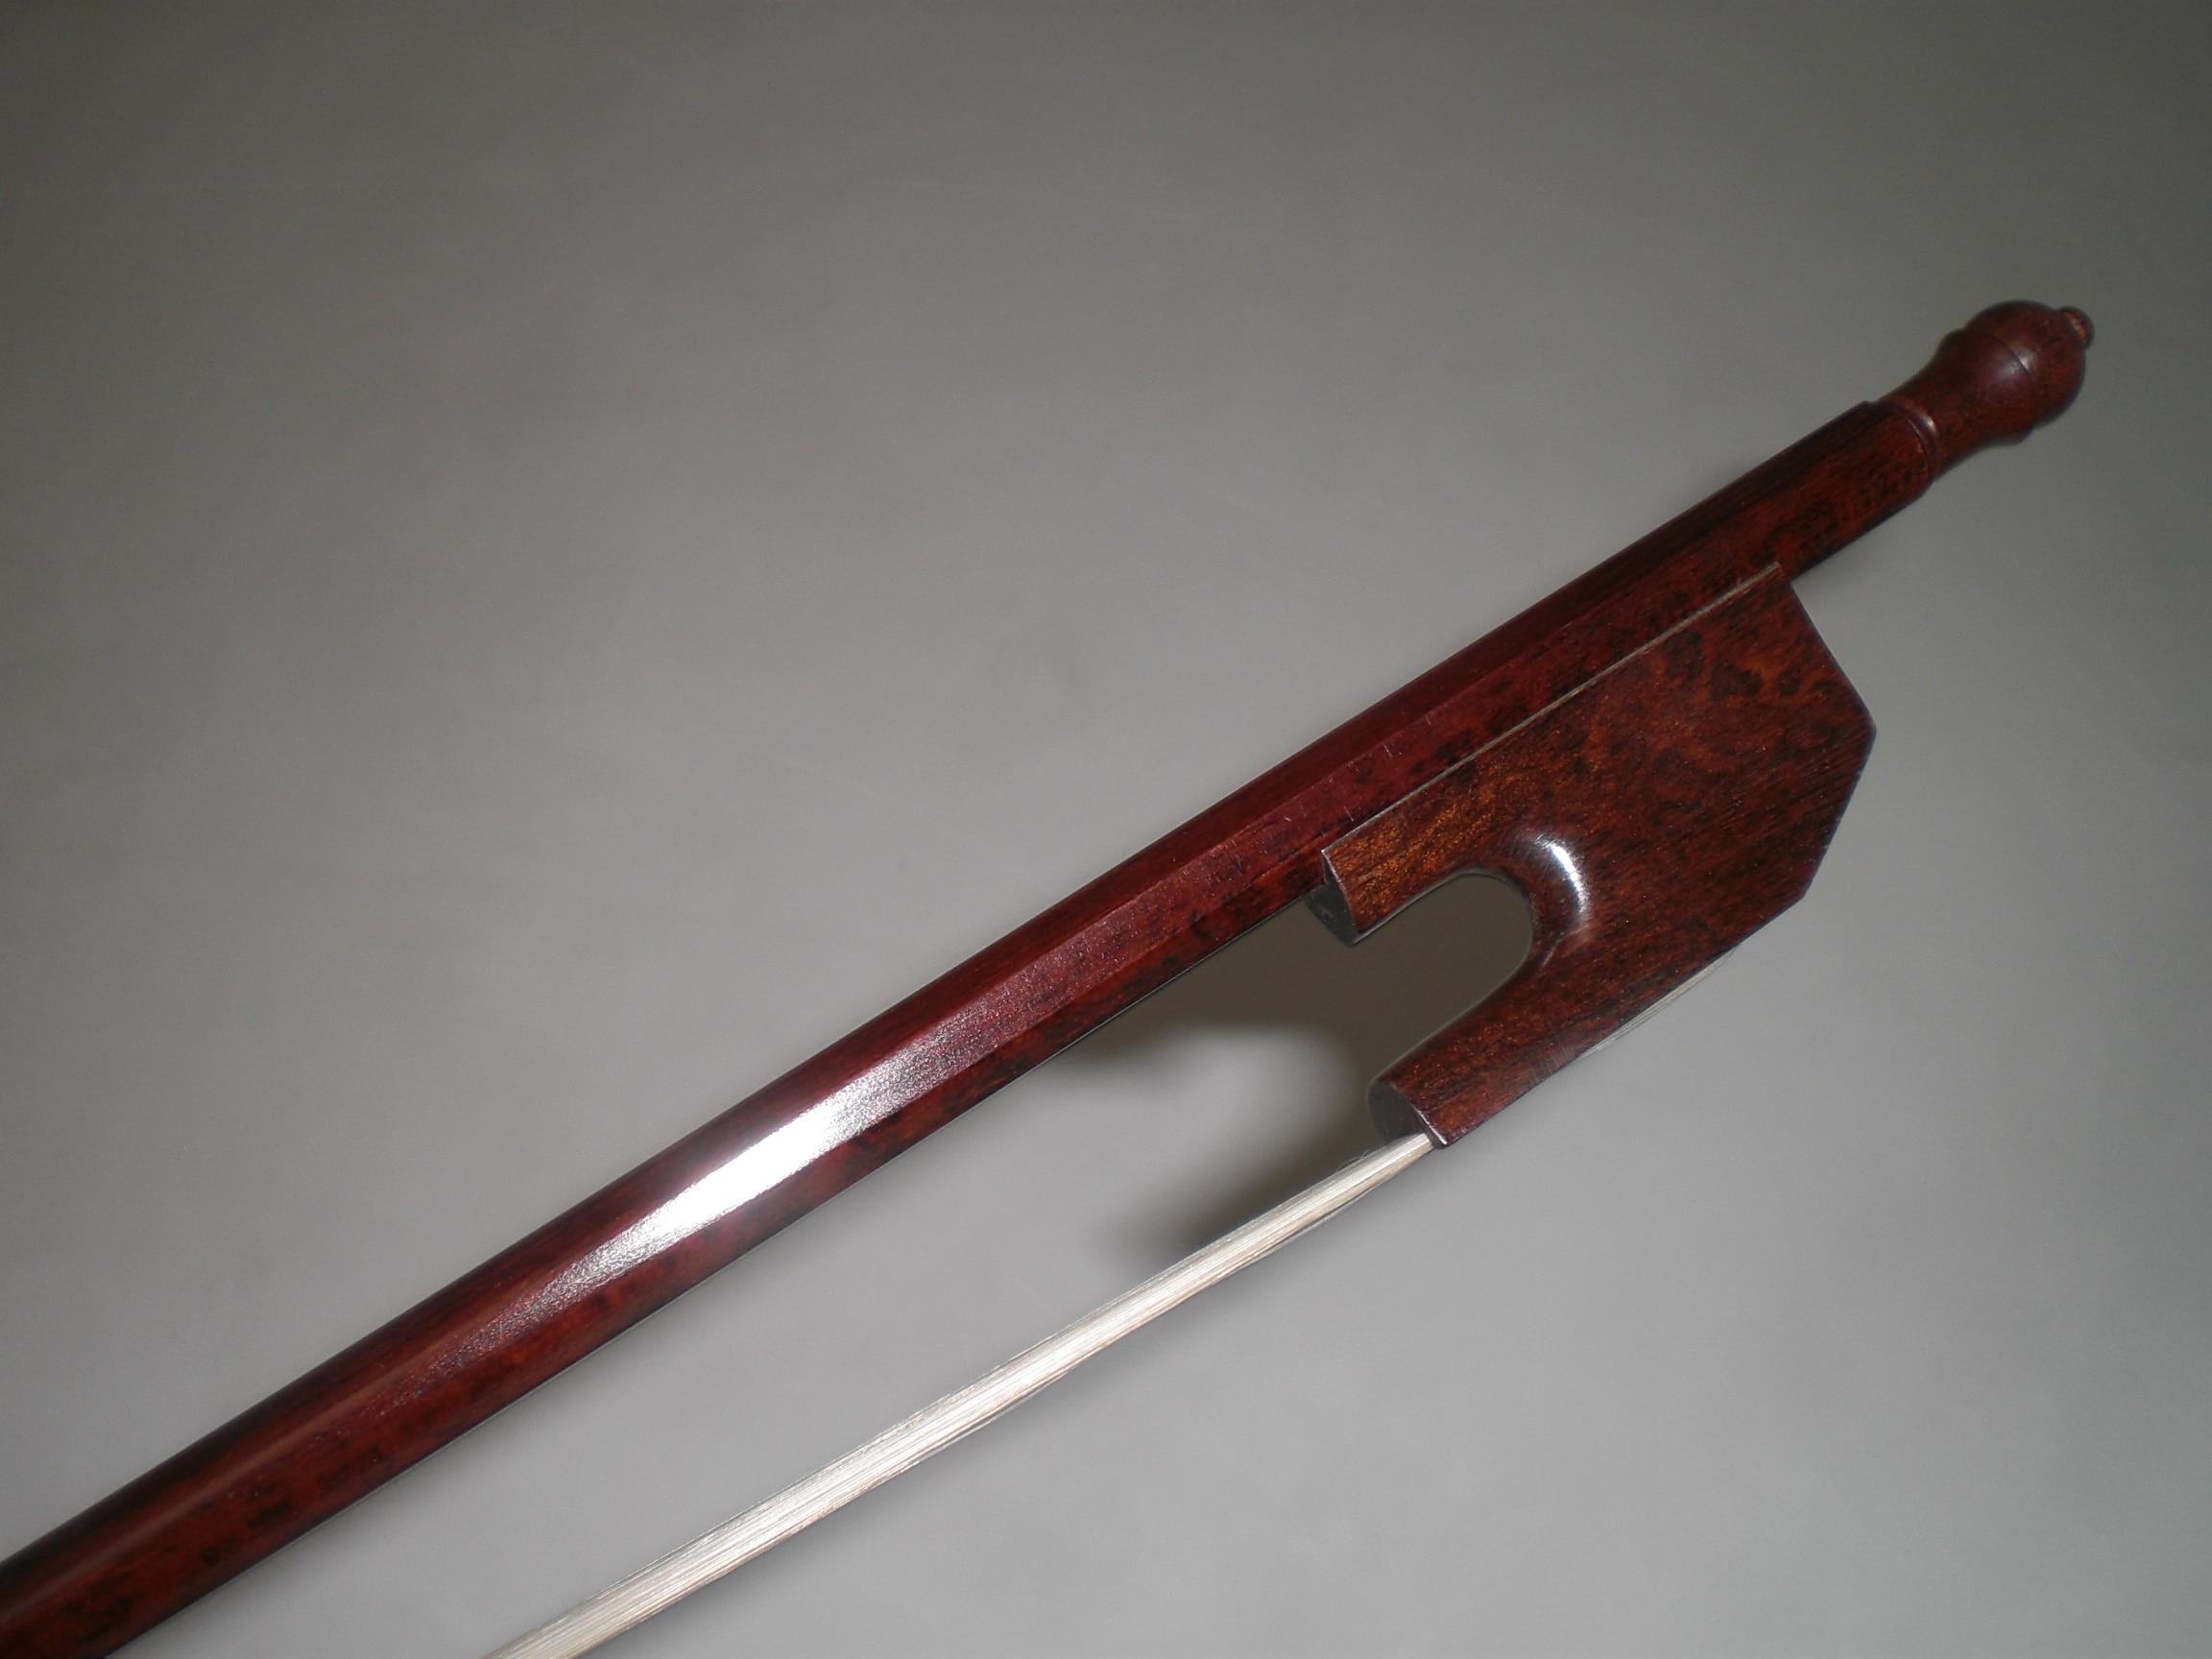 1 pieza nuevo tipo Cello arco serpiente madera barroco Cello arco 4/4 pelo blanco - 2